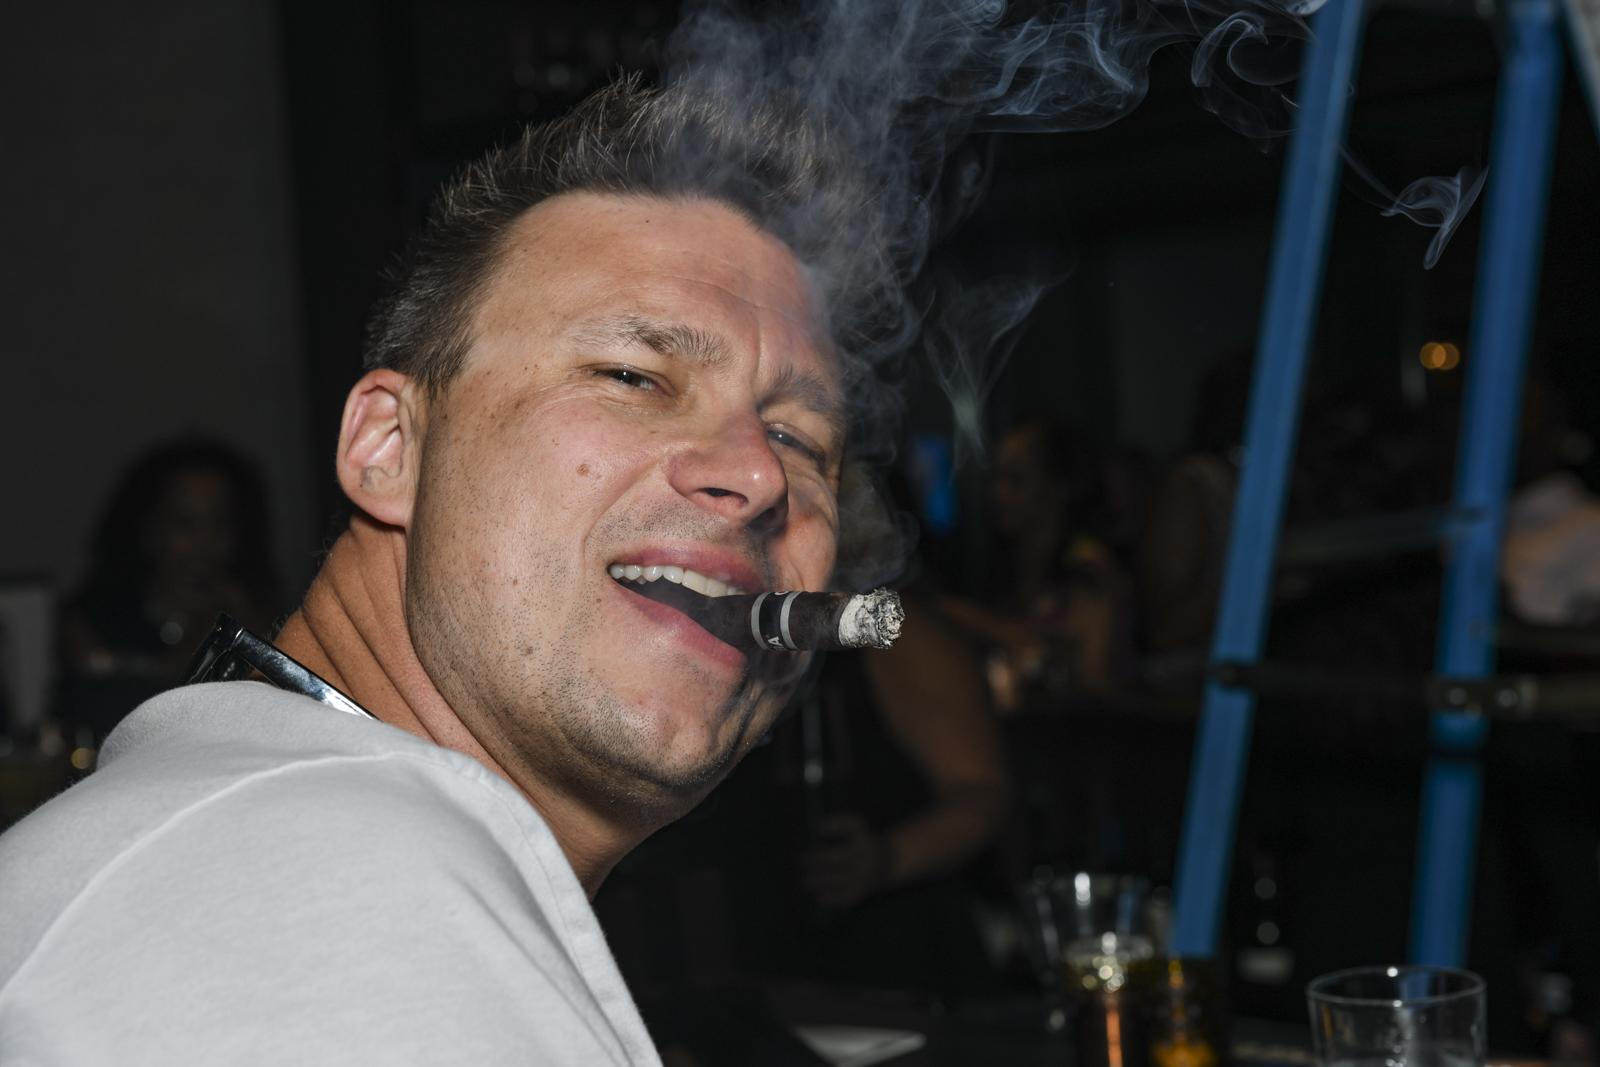 Burn-atlanta-cigar-7927.jpg